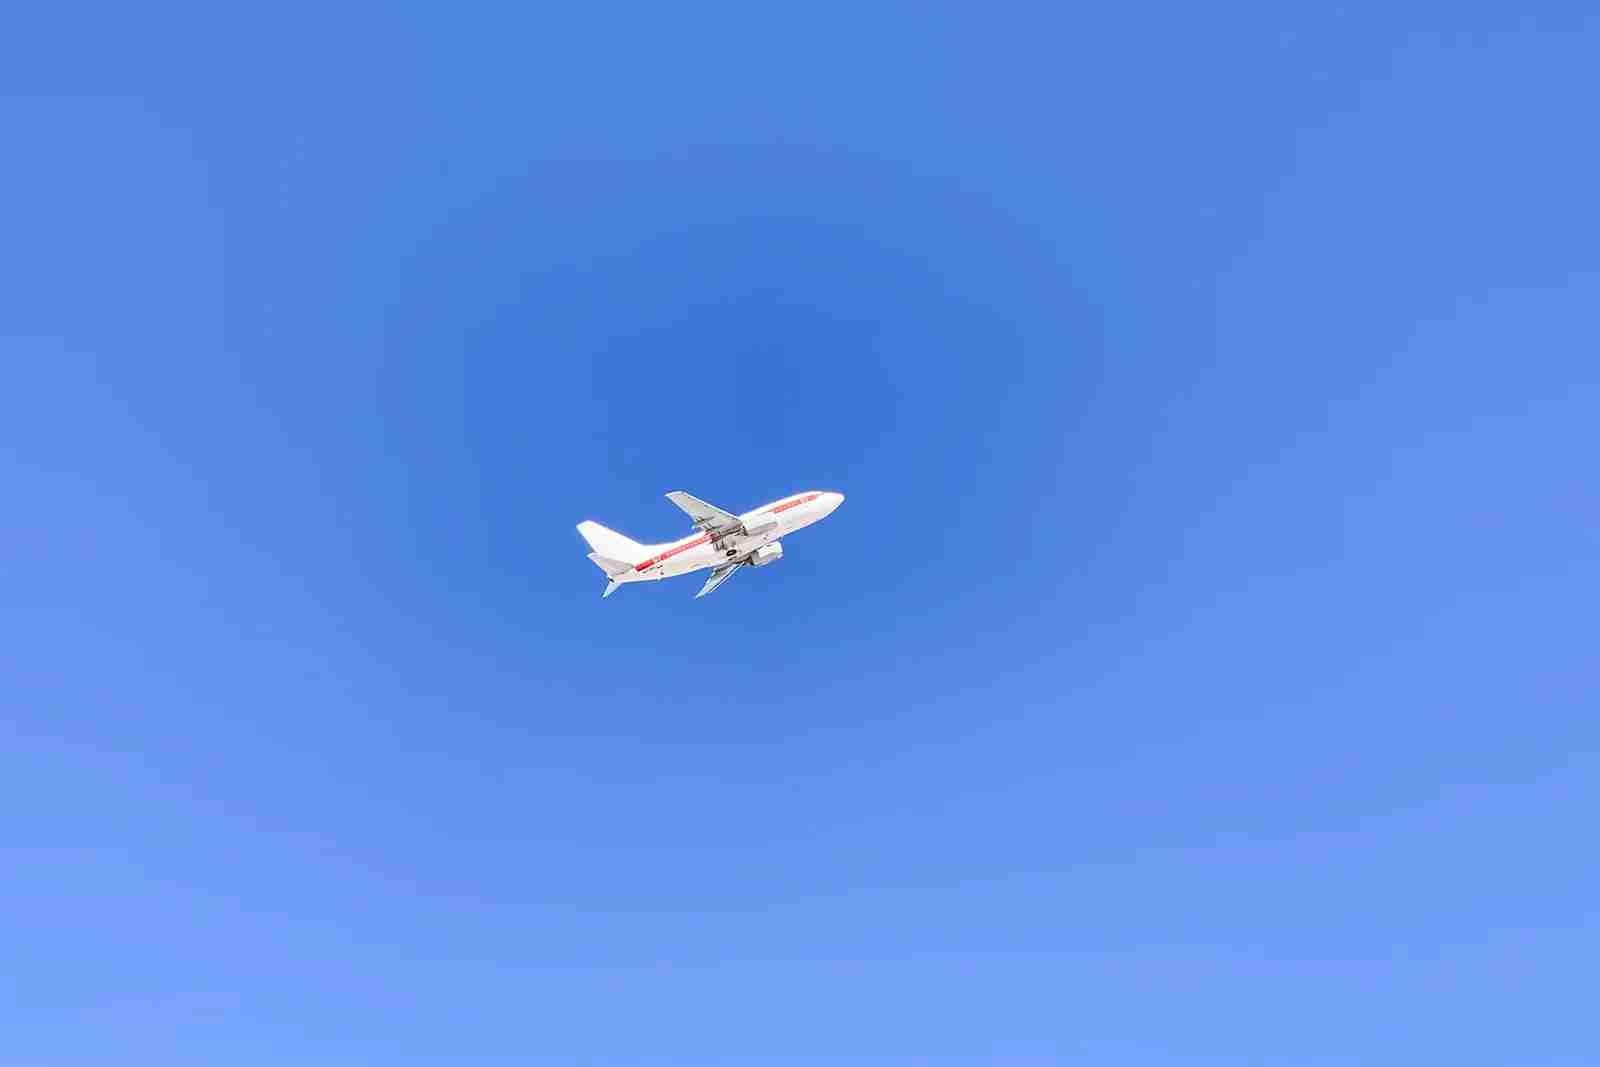 A Janet plane takes off, destination unknown.